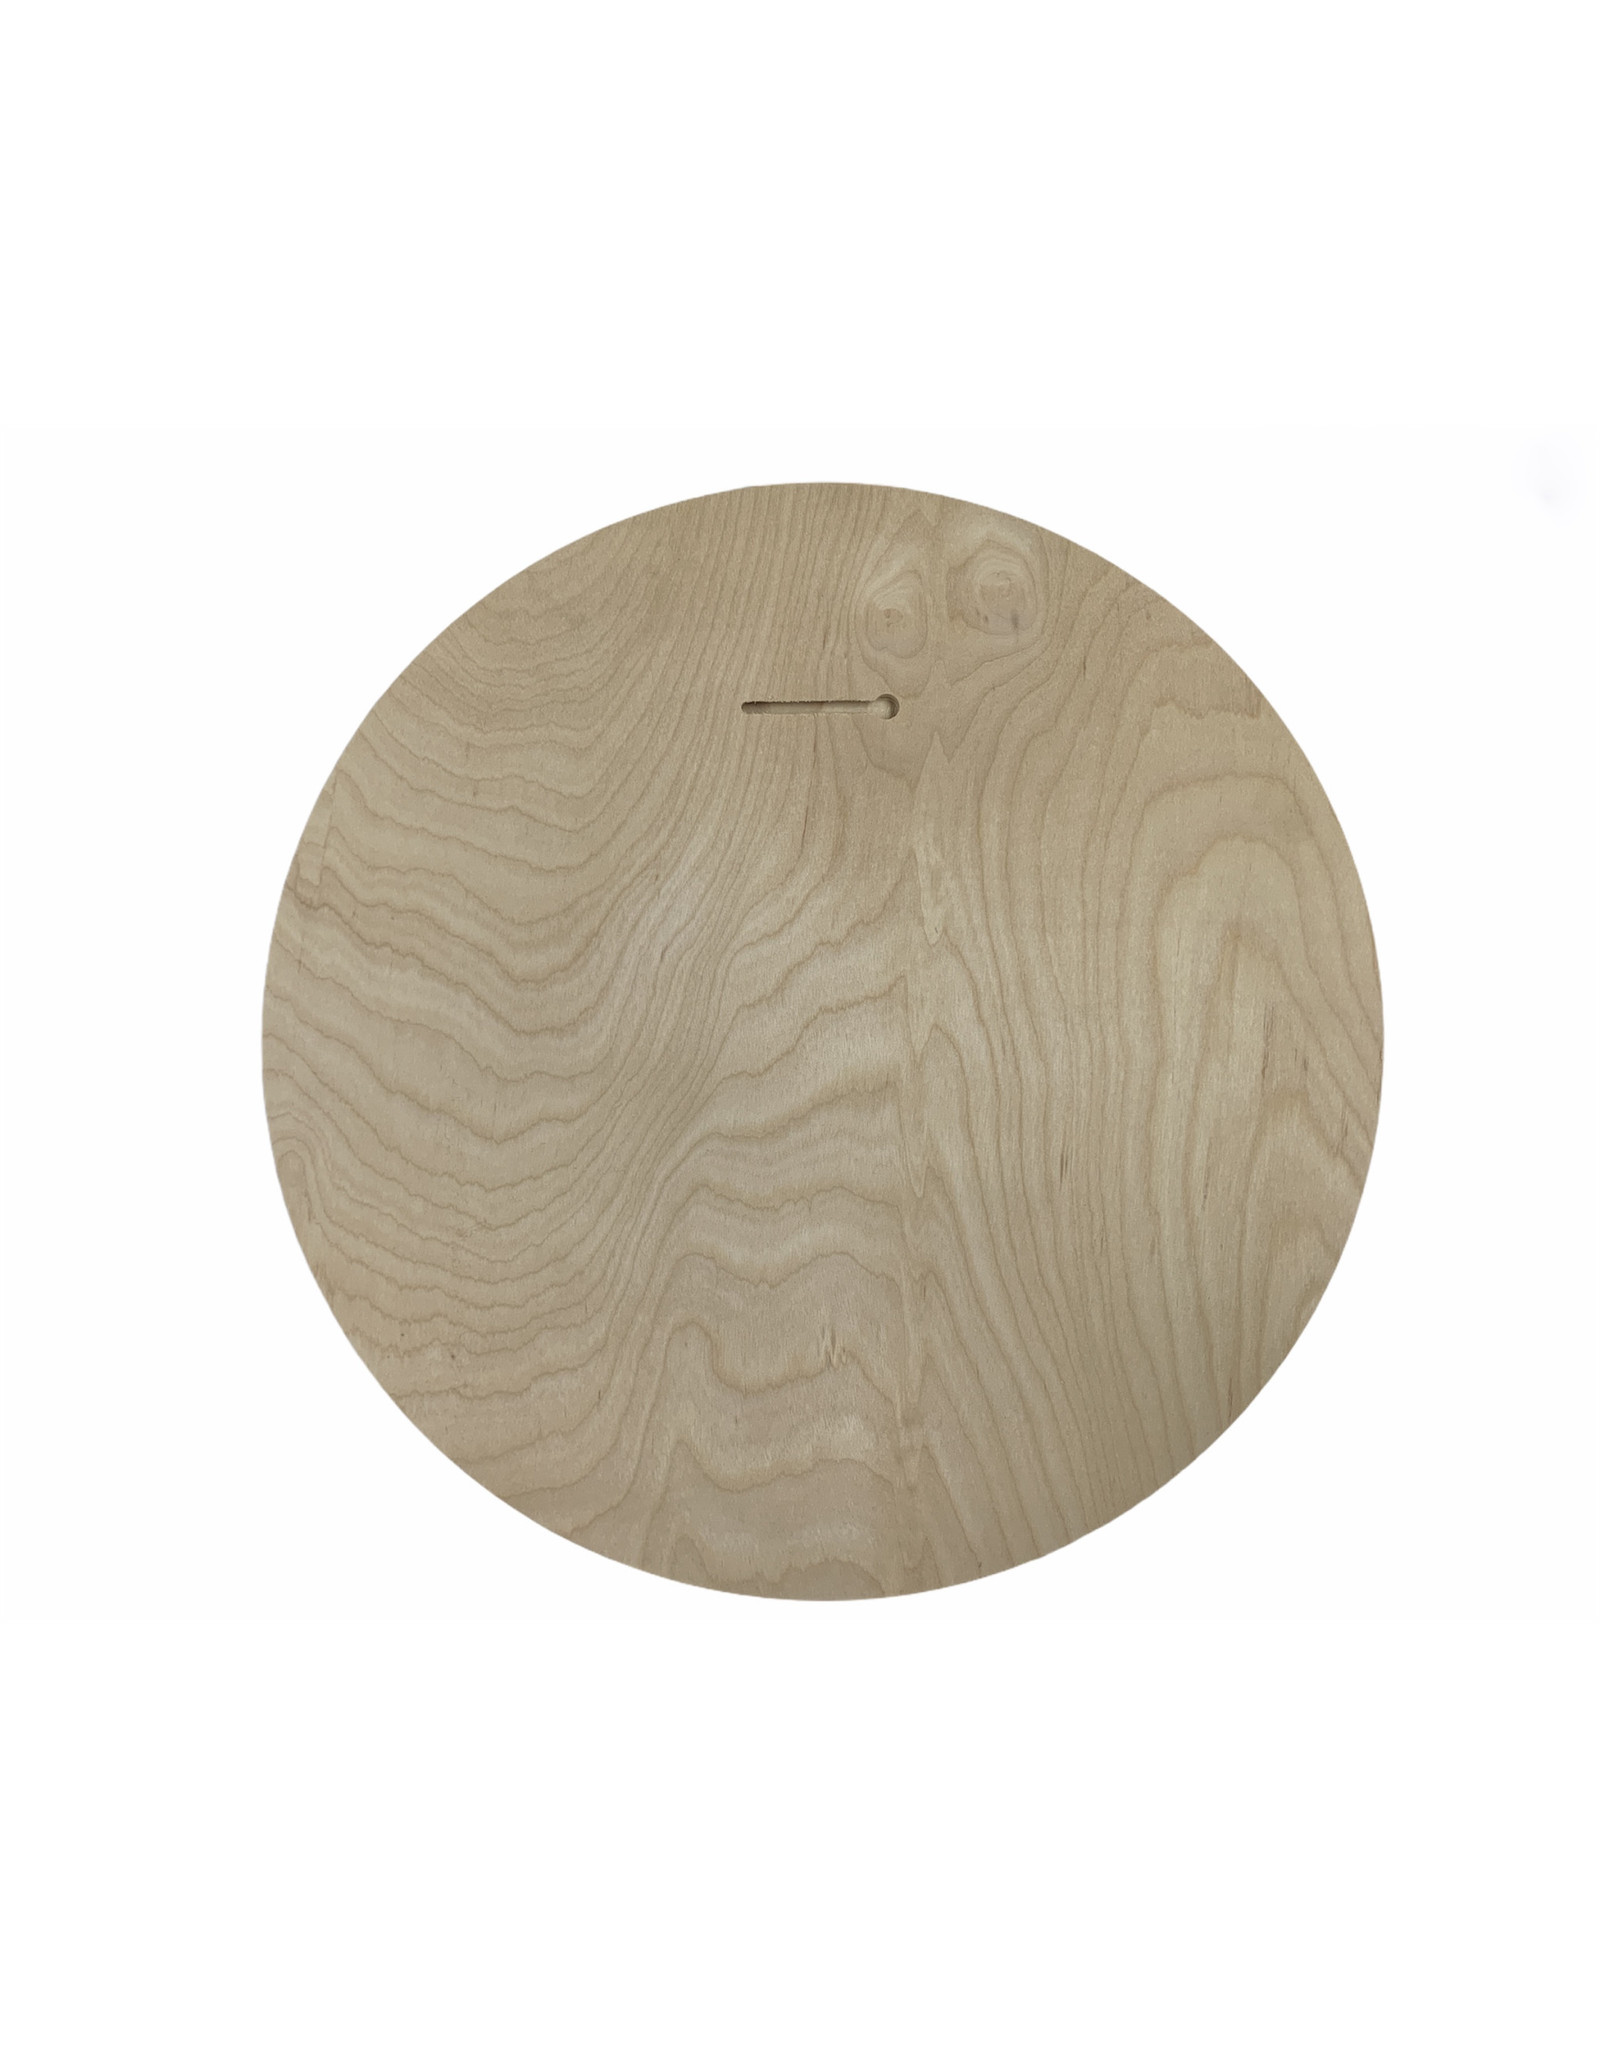 "Blue 84 HB PALM TREE WOOD CIRCLE SIGN 15.75"""